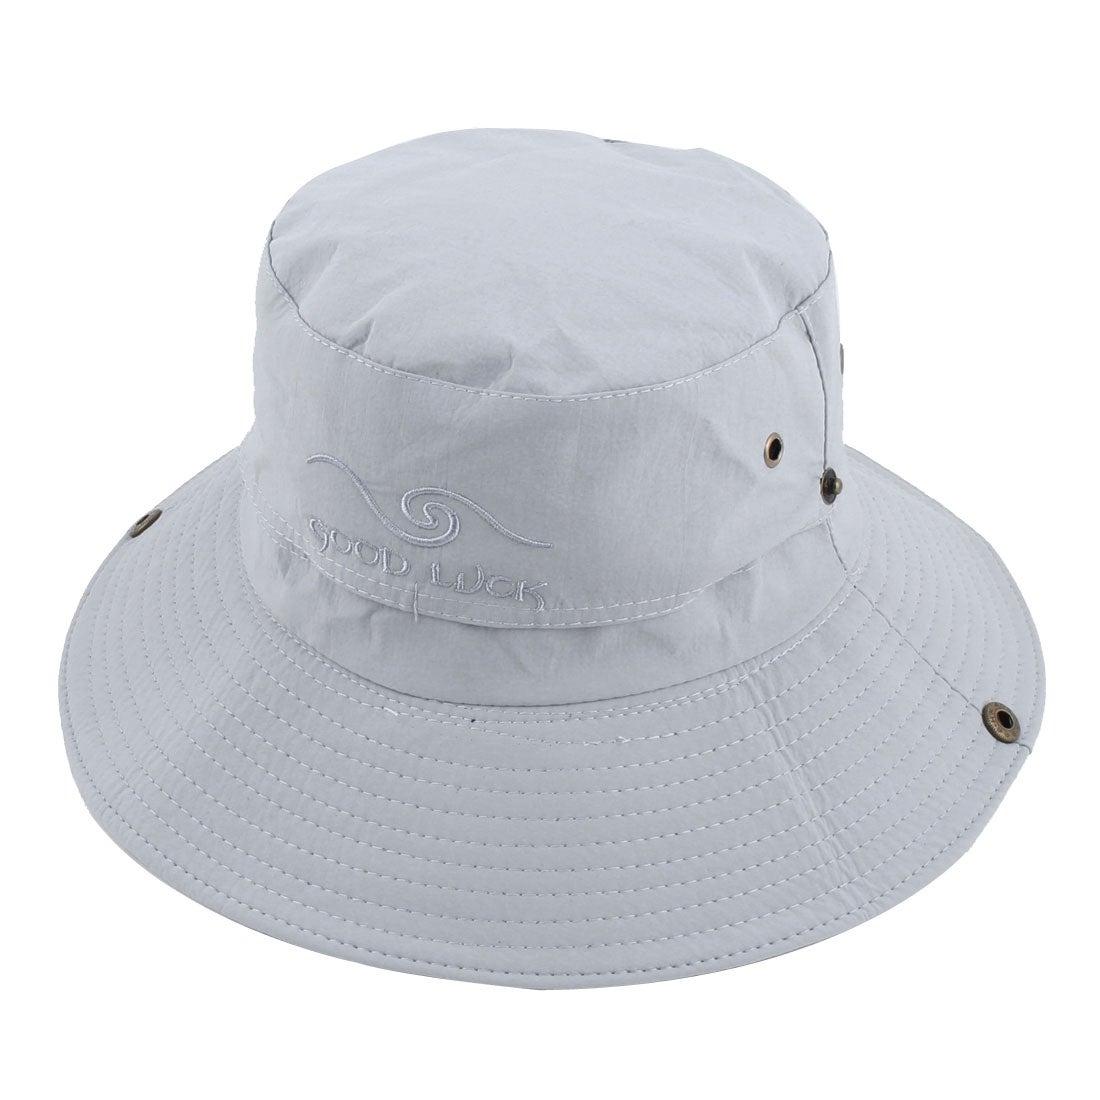 Outdoor Sport Hiking Mesh Wide Brim Protector Bucket Summer Cap Fishing Hat  Gray 5392f217f13